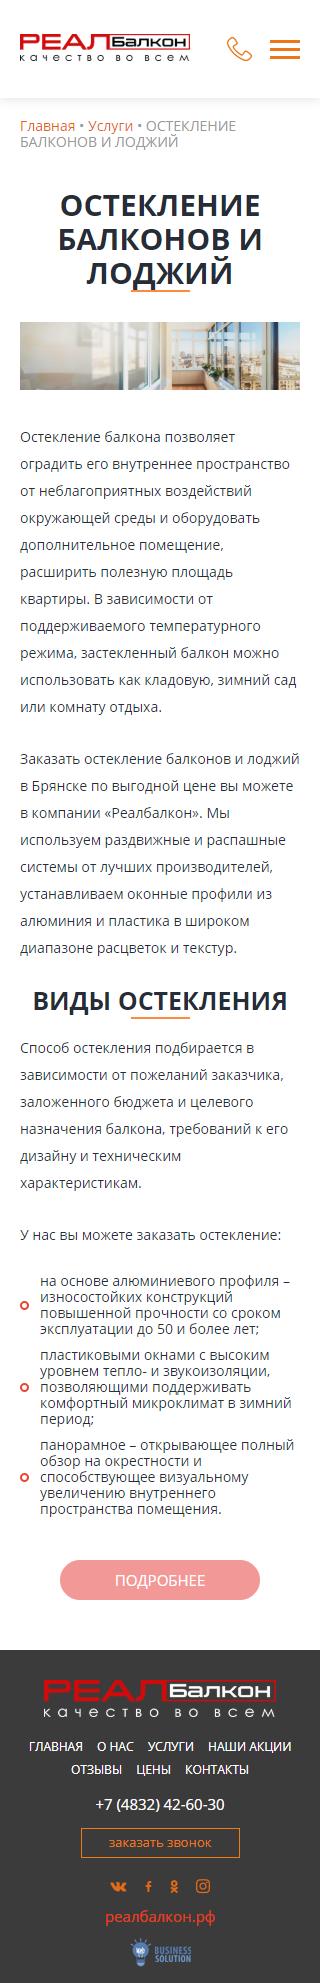 Текстовая страница